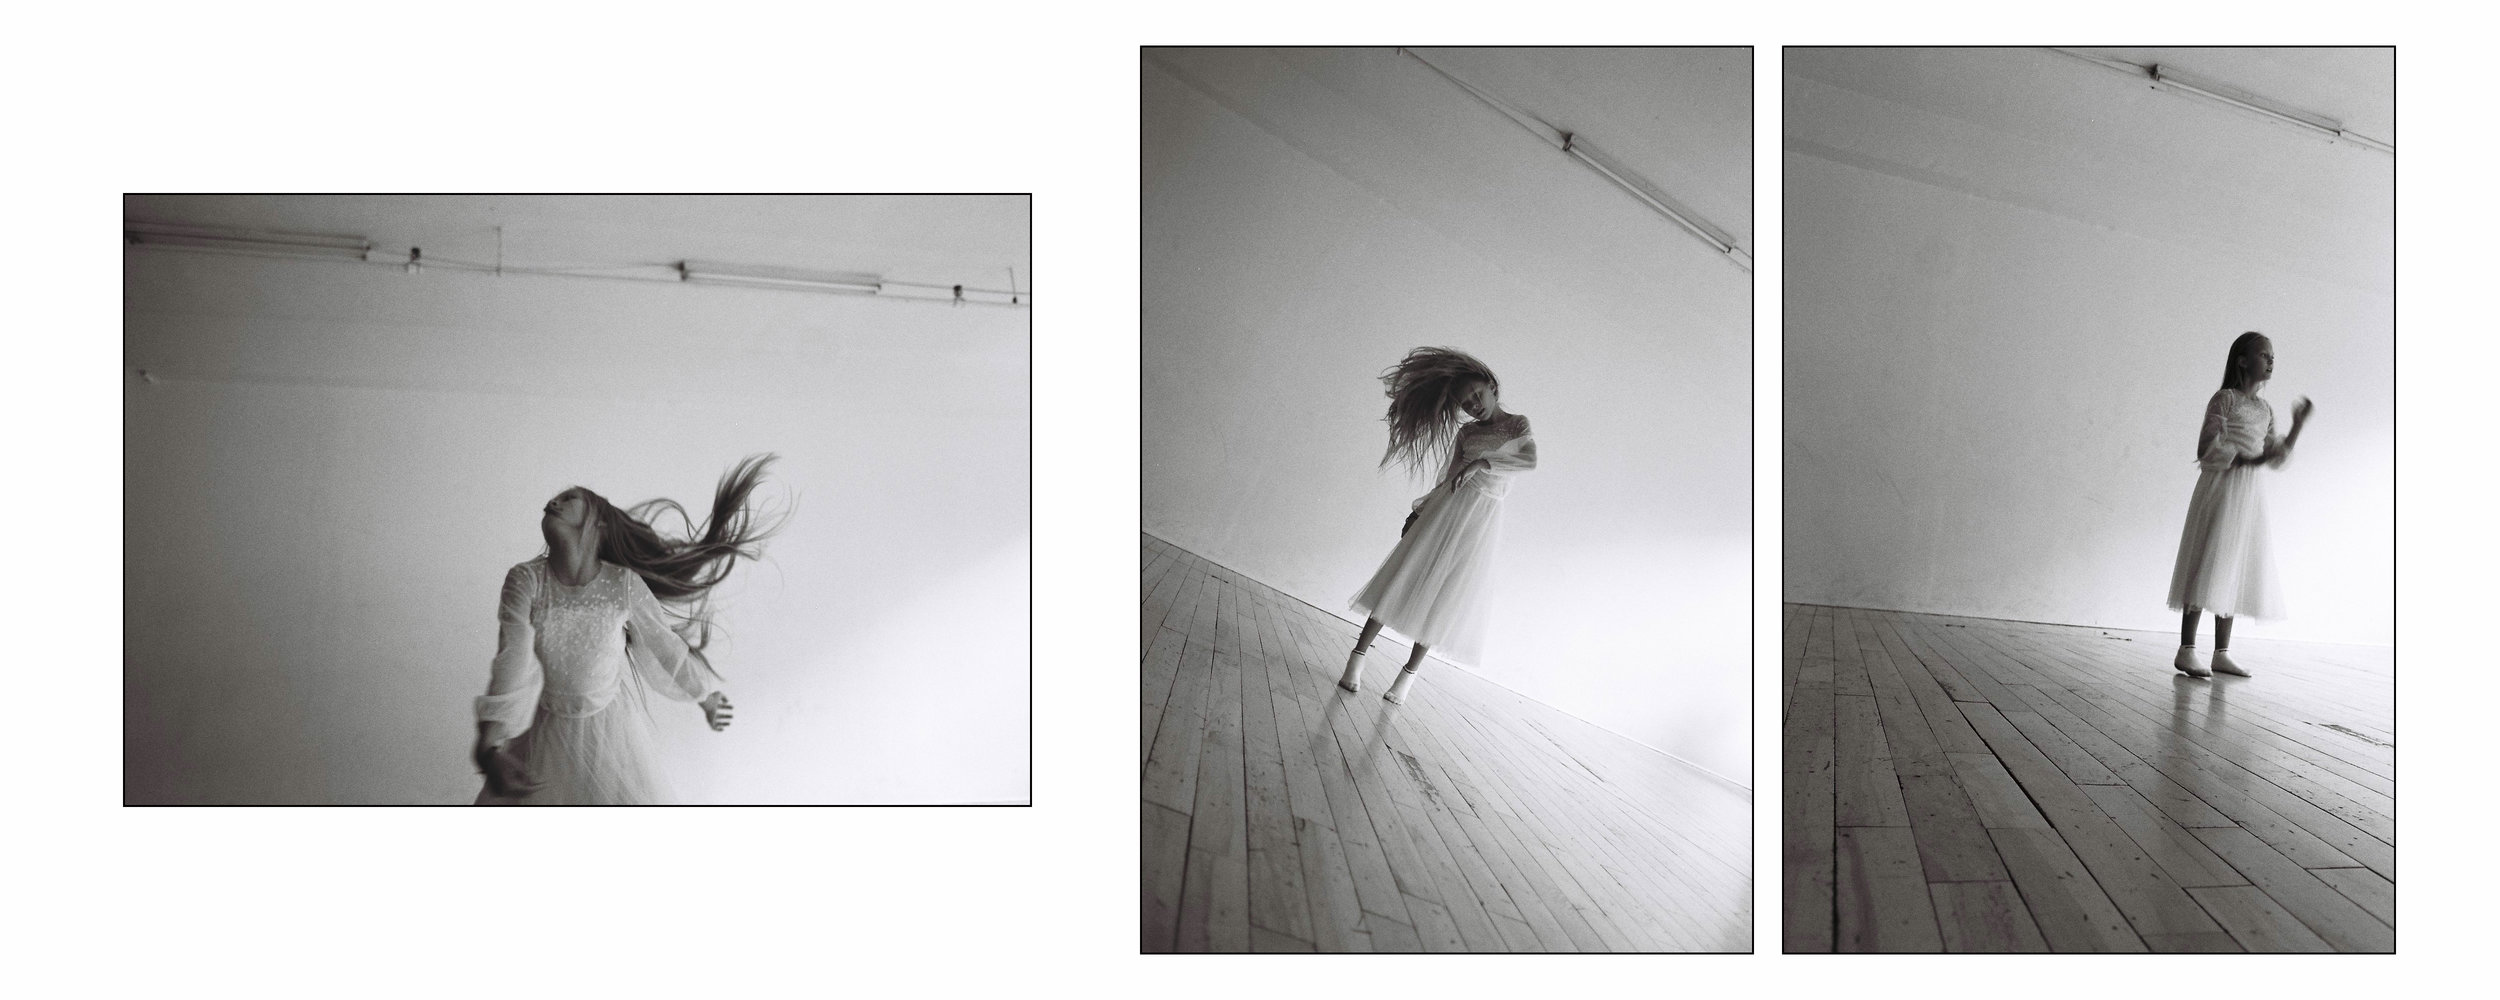 Alisa - Dance collage.jpg